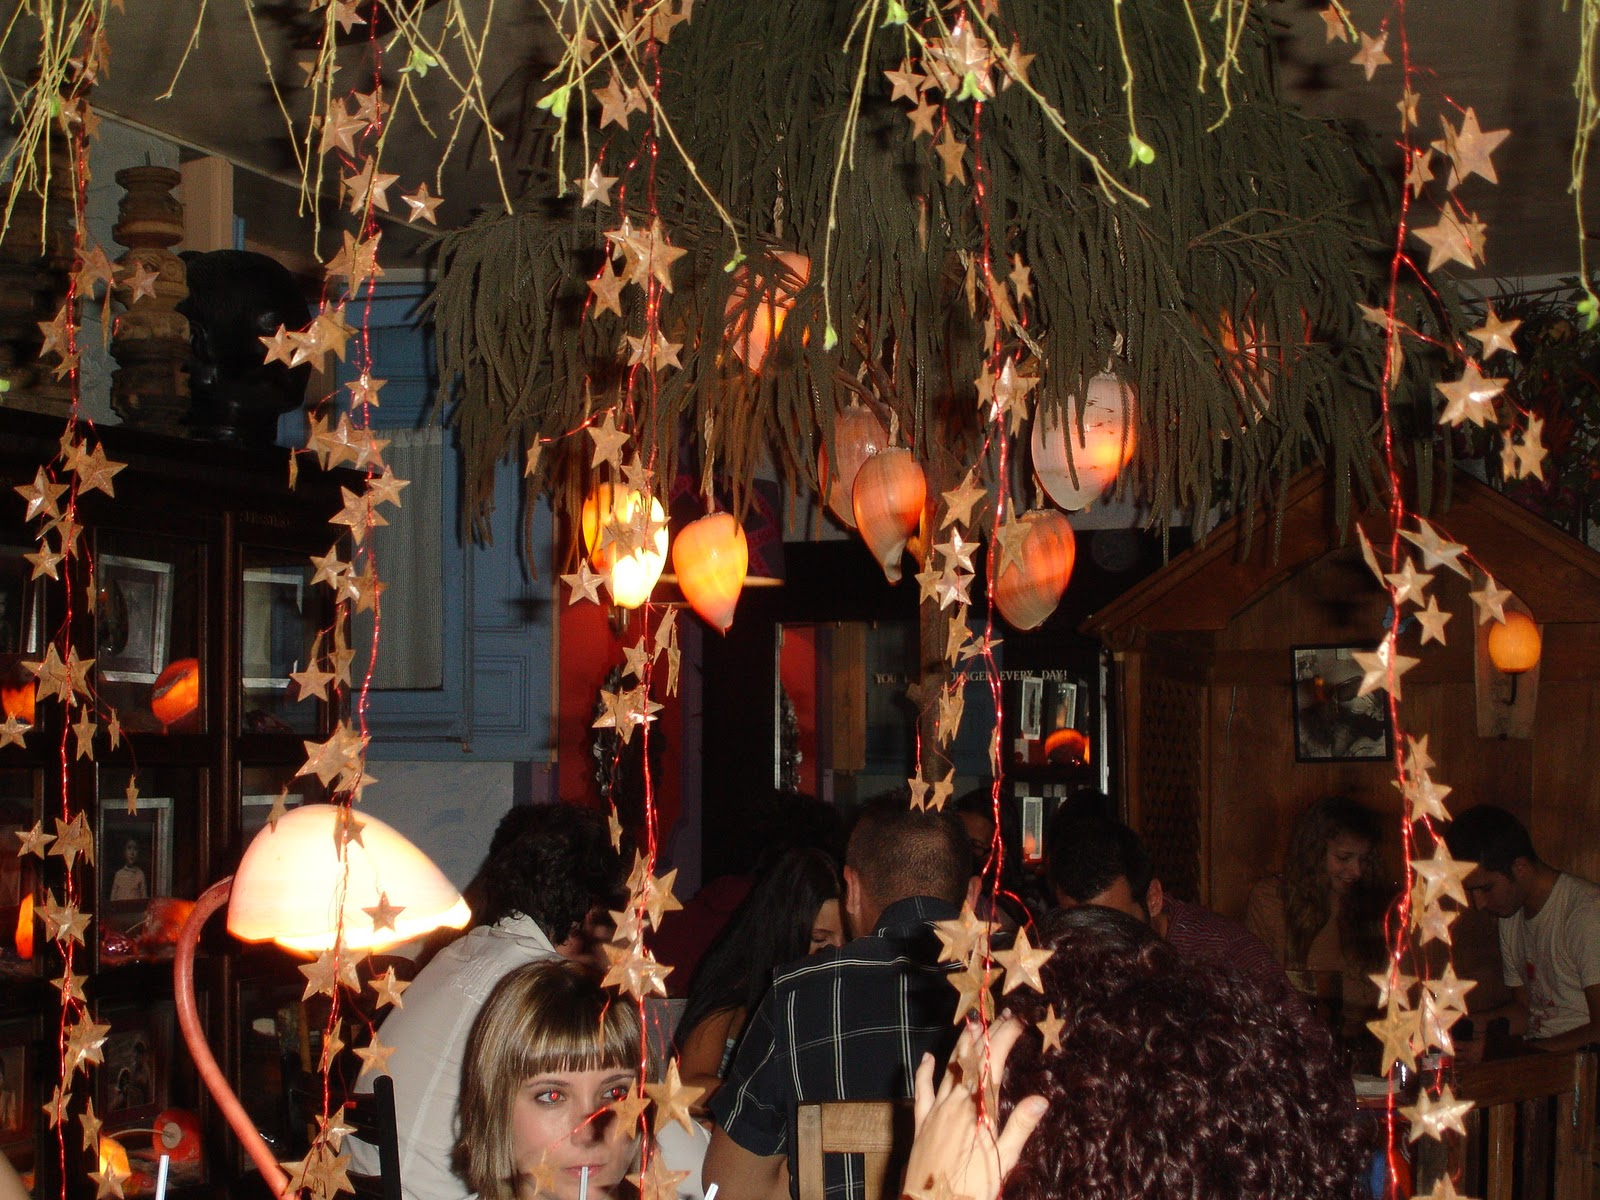 Vuelta abierta blog de viajes el jard n secreto madrid - El jardin secreto restaurante madrid ...